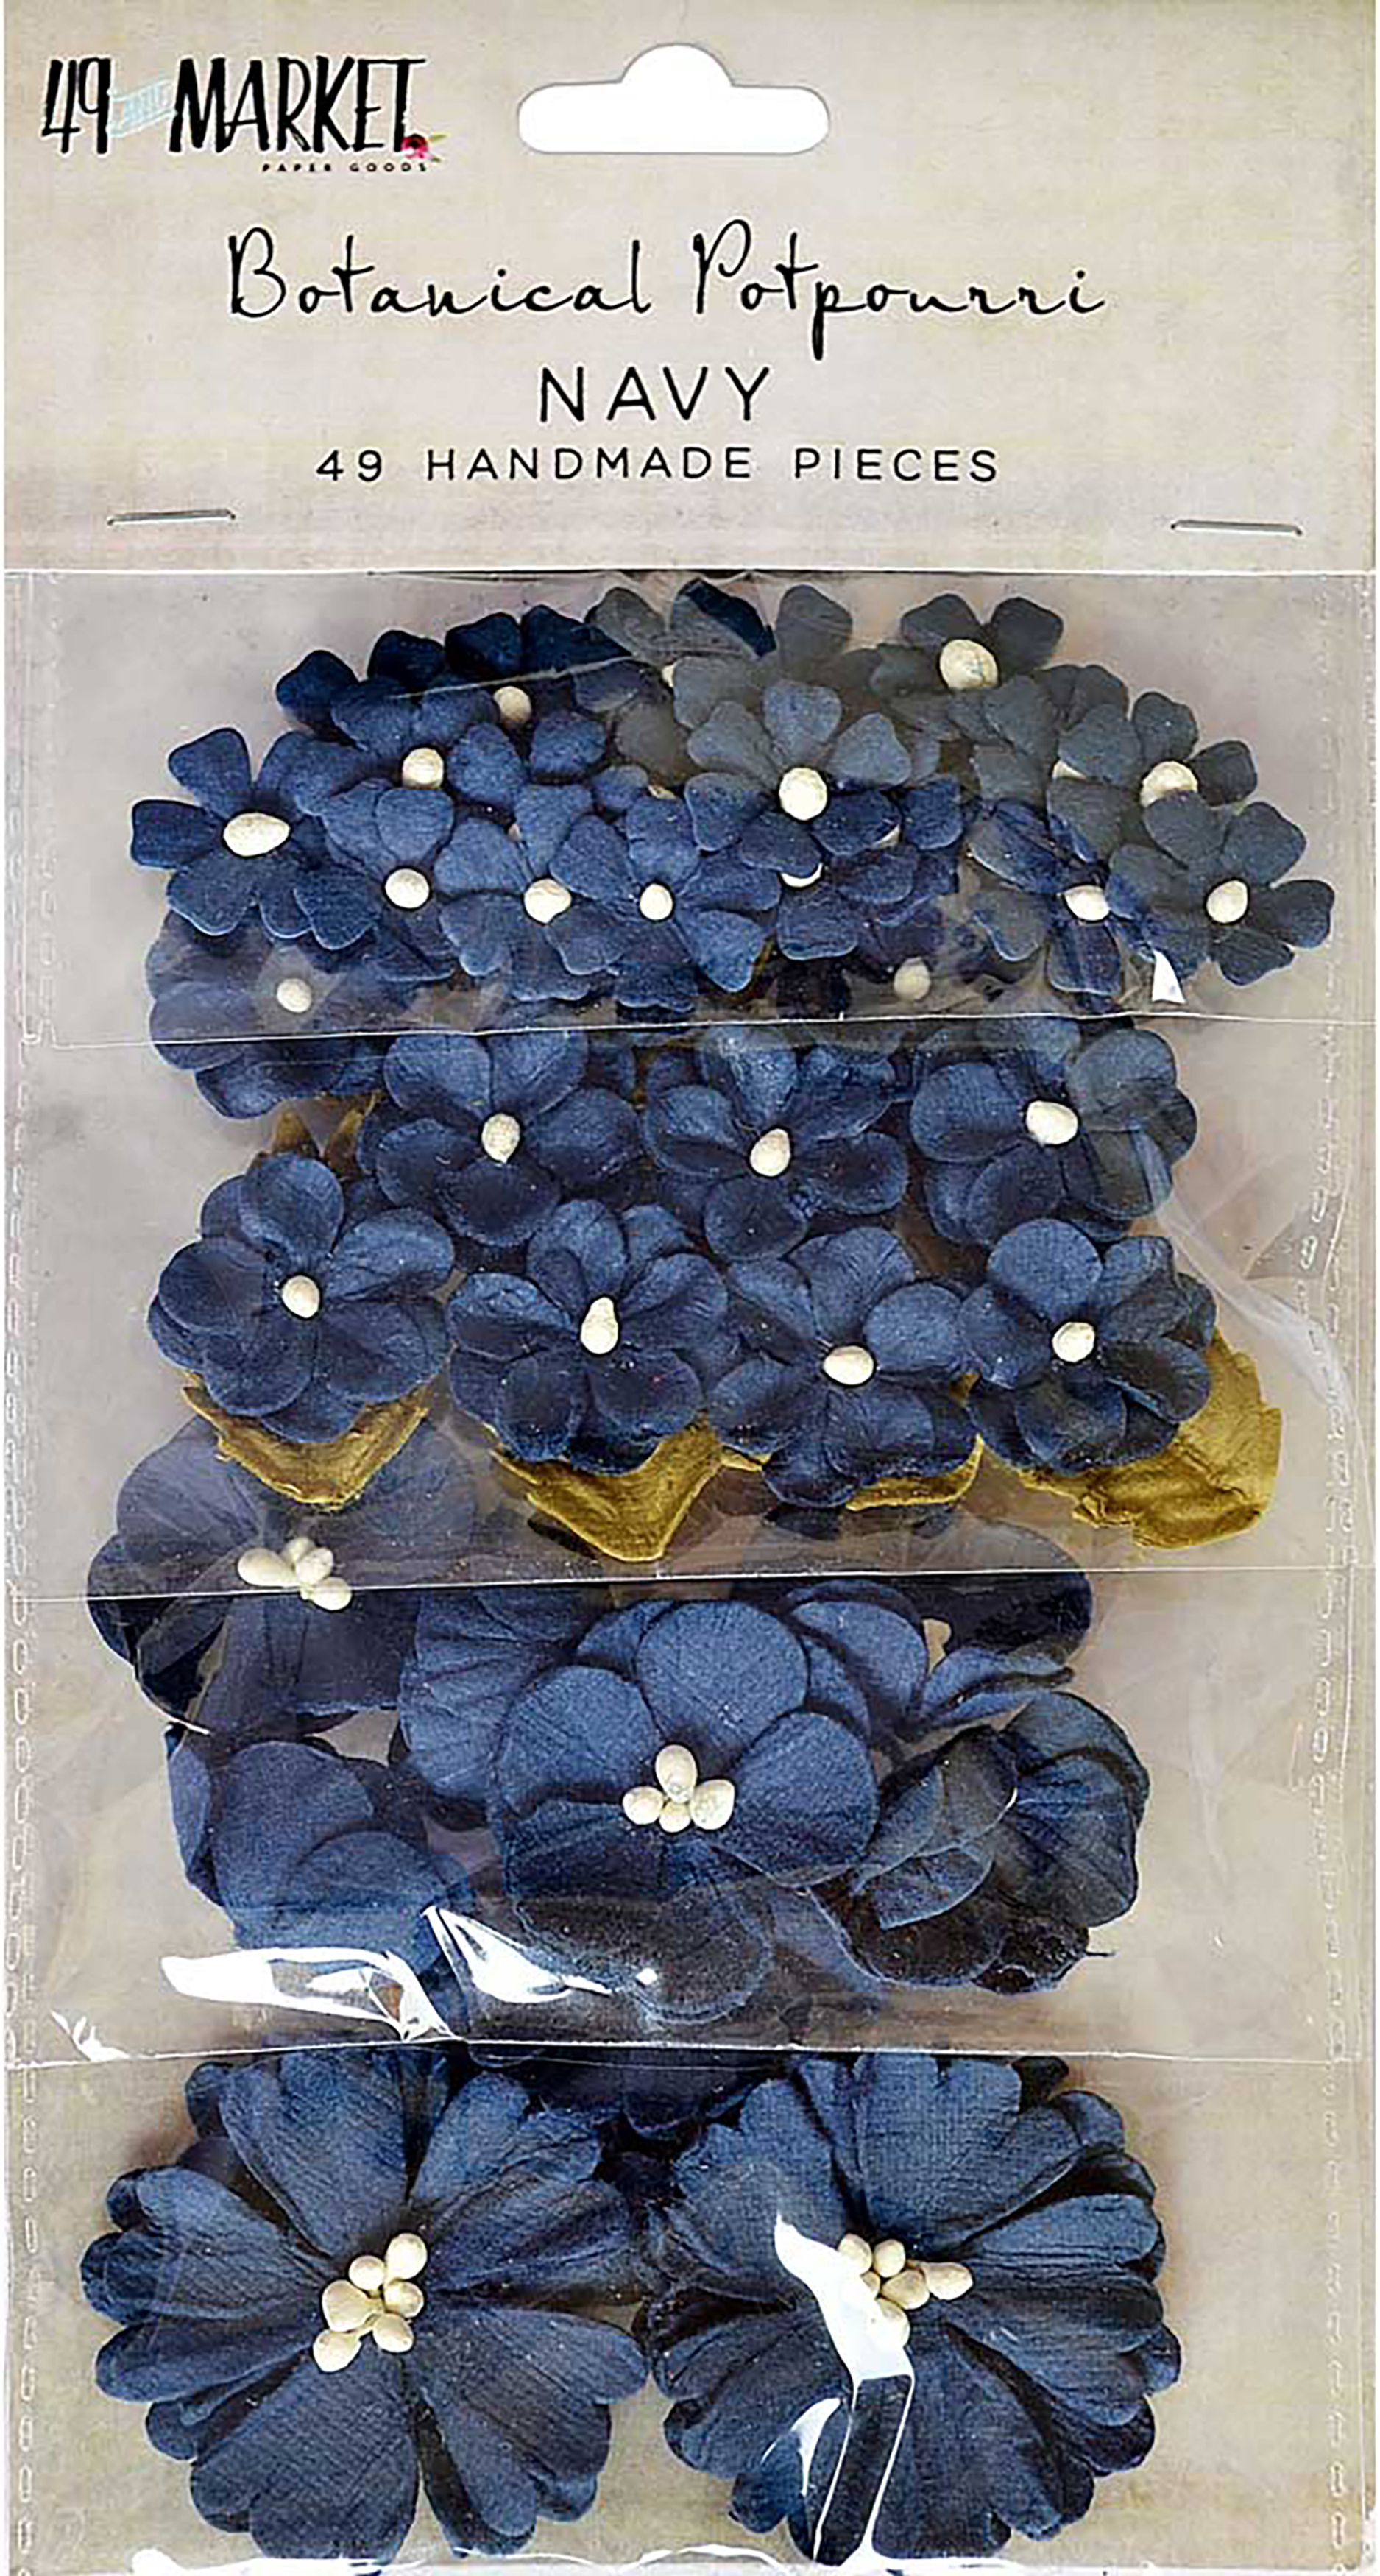 49 And Market Botanical Potpourri Flowers 49/Pkg-Shadow